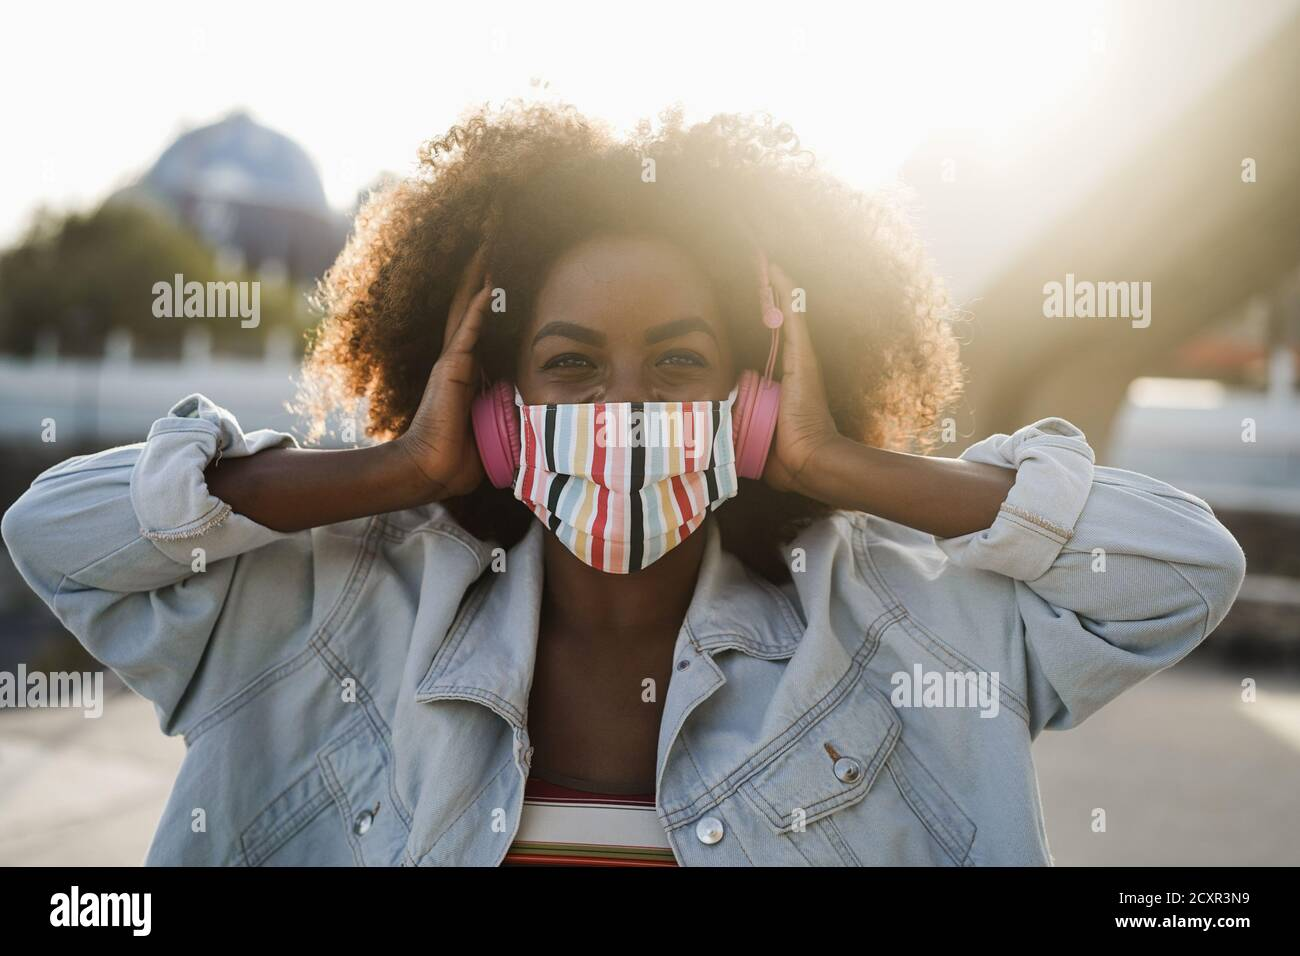 Chica negra escuchando música con auriculares mientras lleva máscara Exterior - concepto de estilo de vida Coronavirus Foto de stock